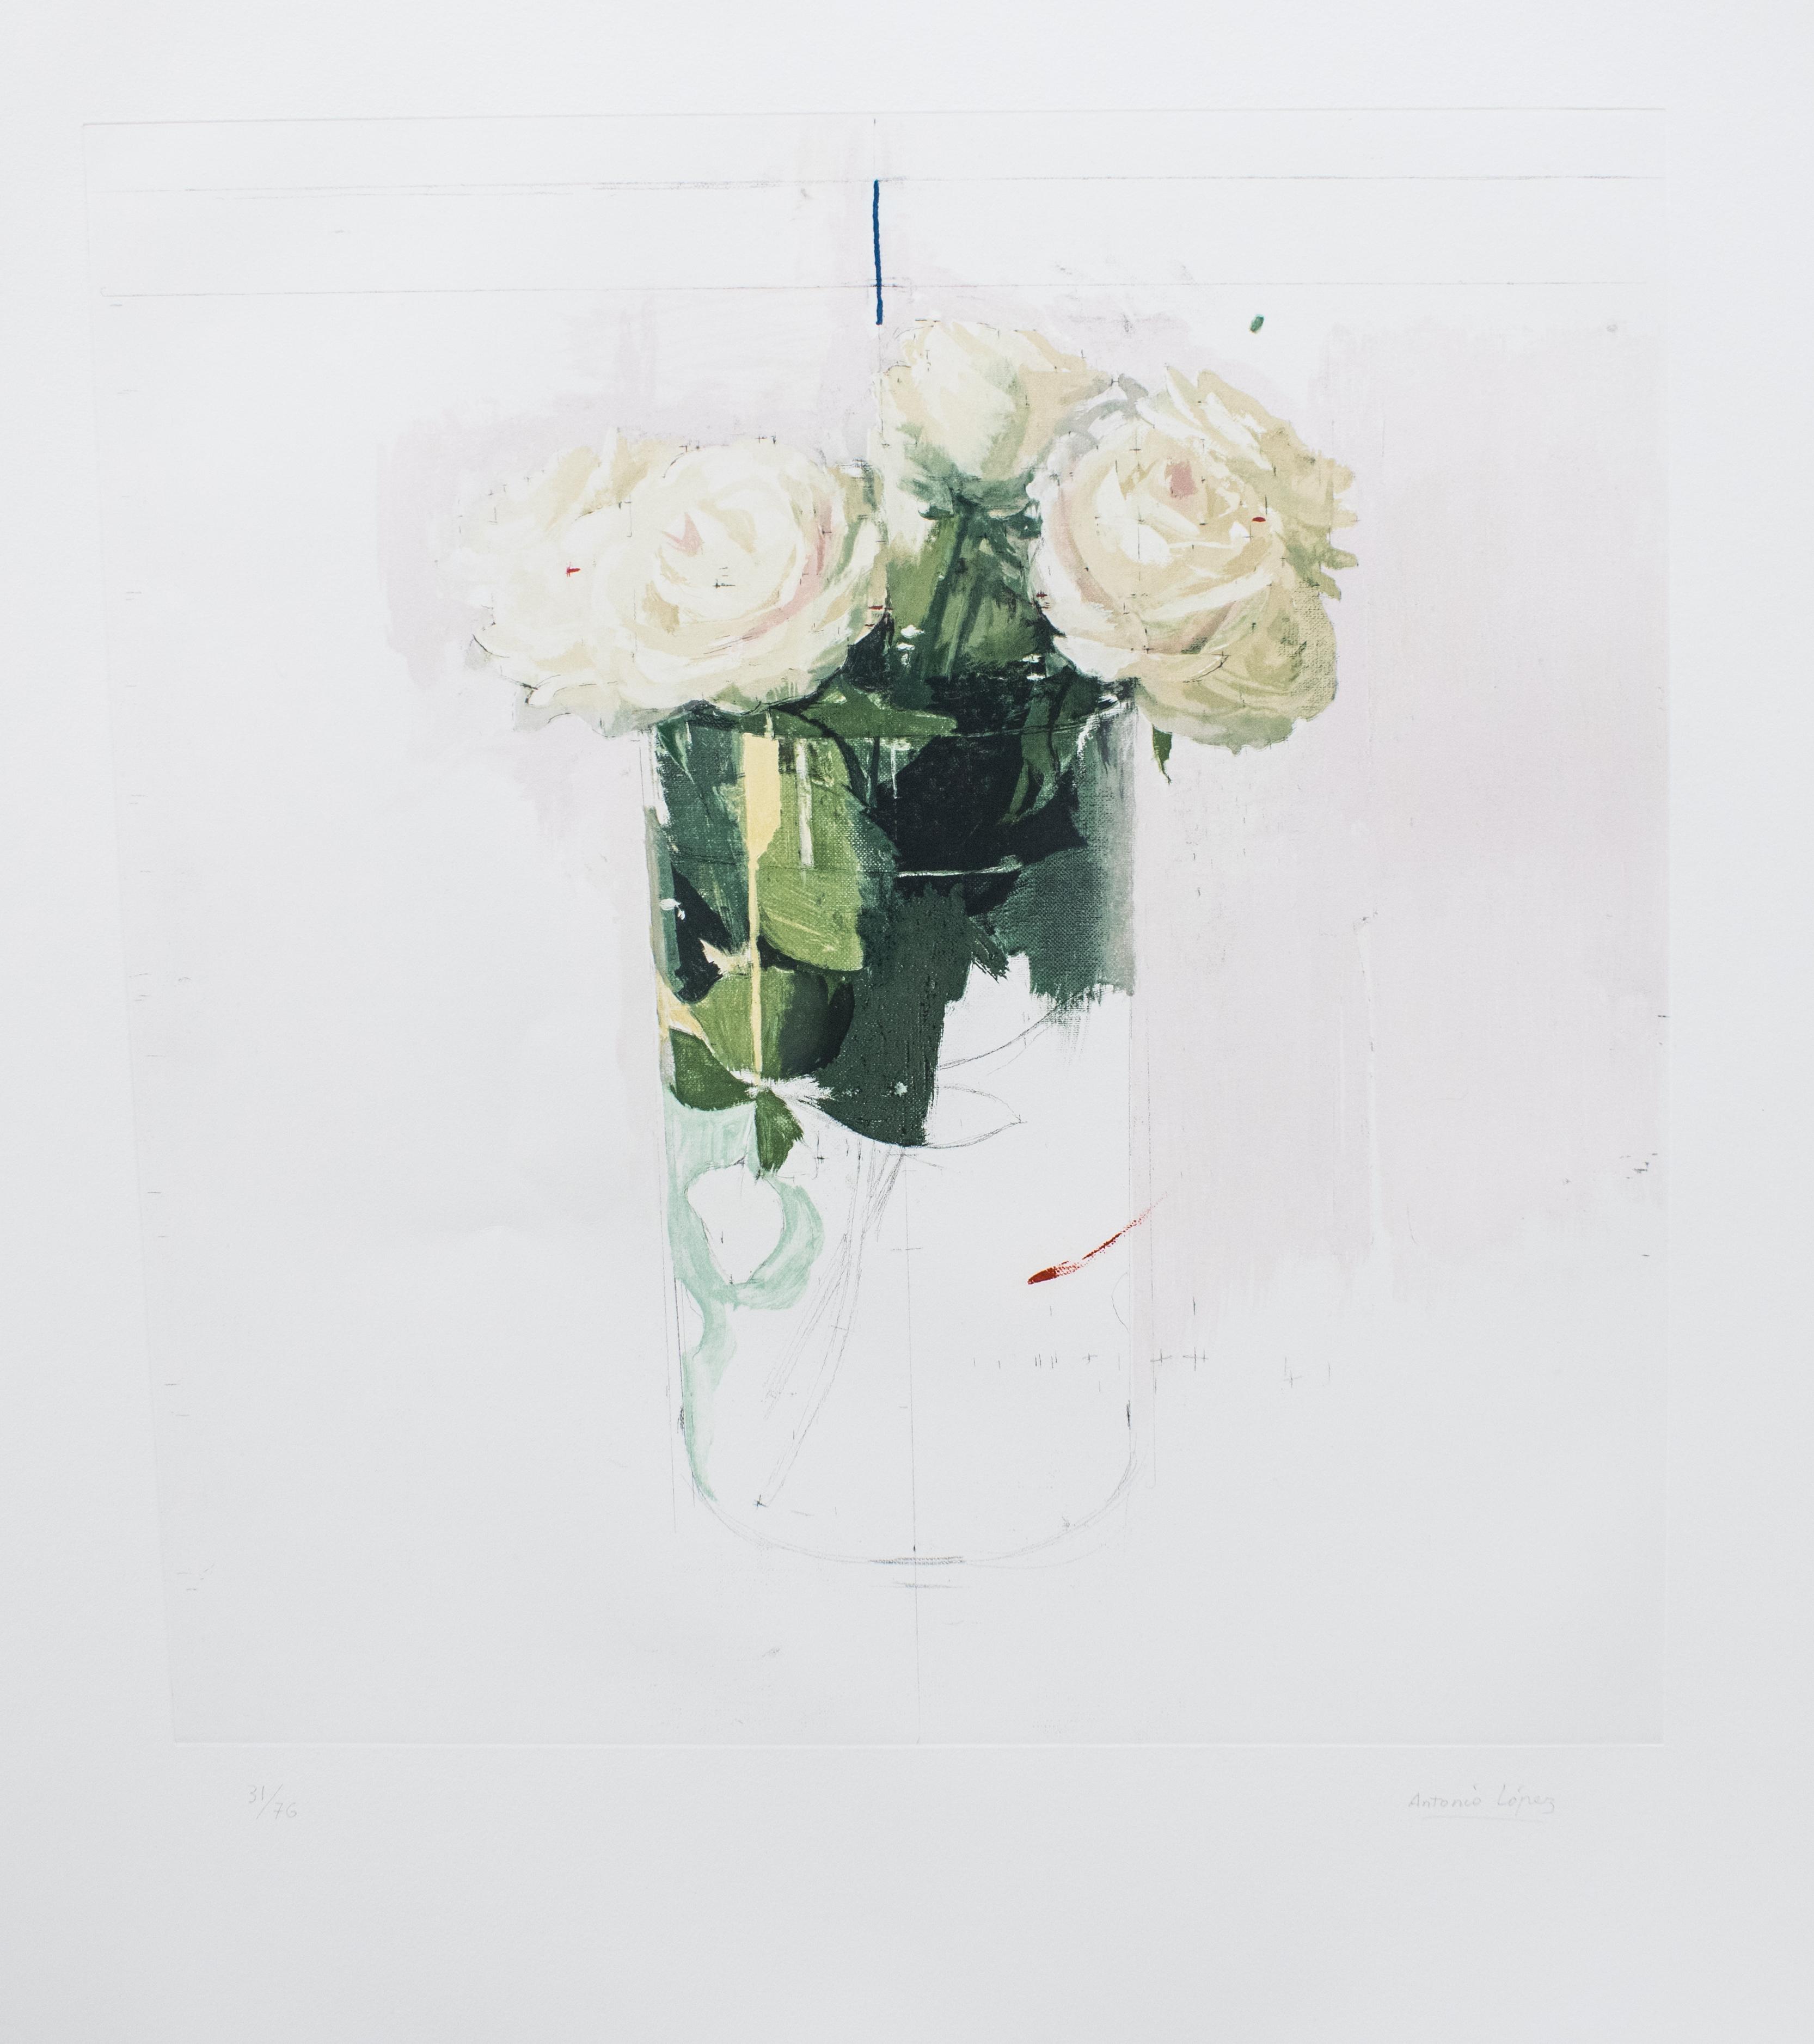 Rosa de Ávila, print, 2018